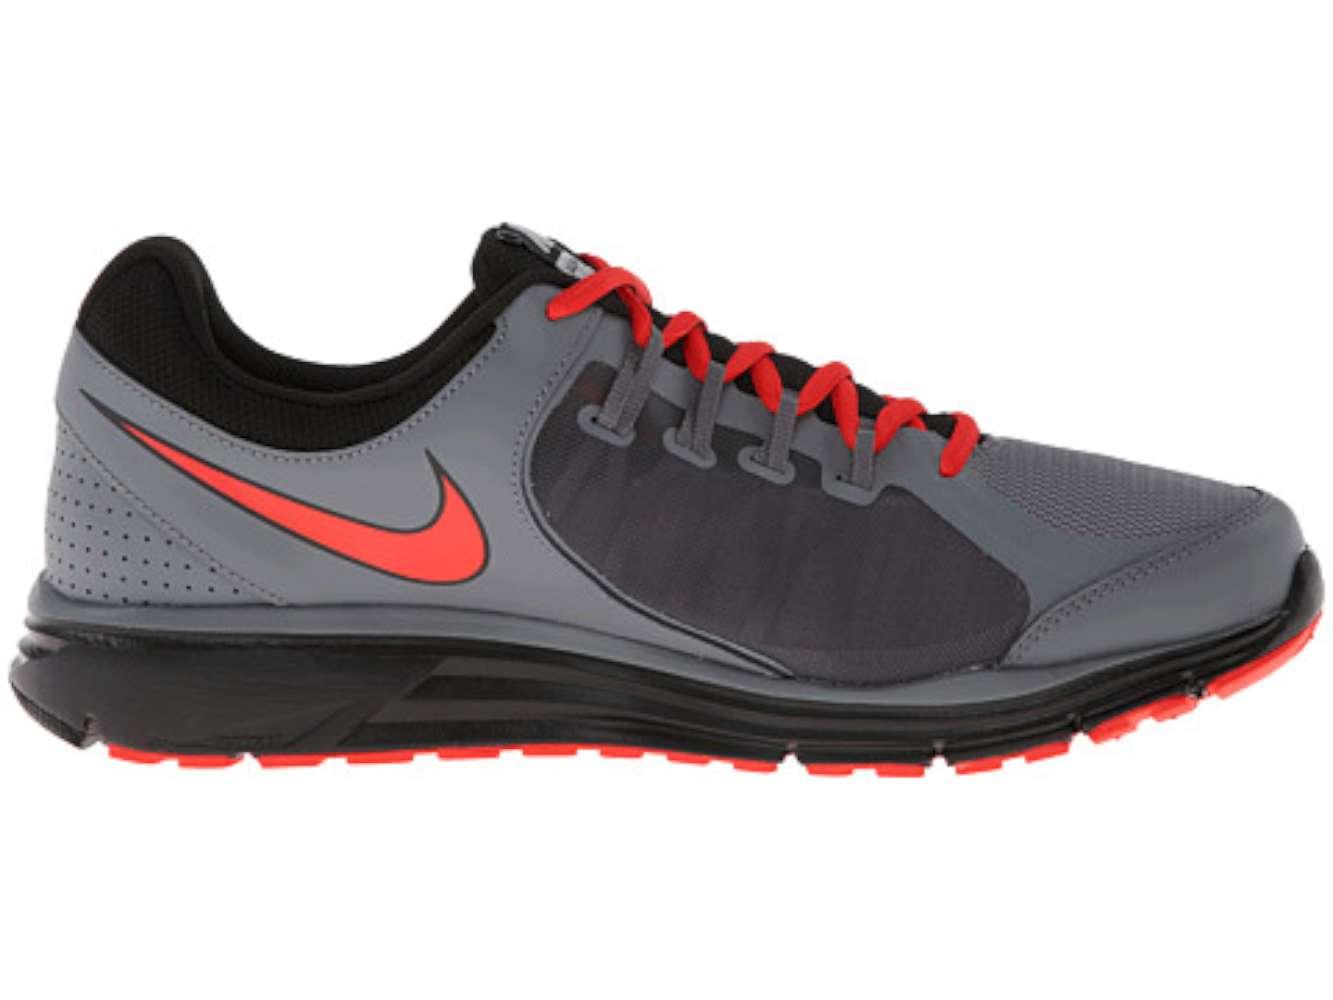 cb0017b08d66 Nike Mens Nike Men s Lunar Forever 3 Low Top Lace Up Running